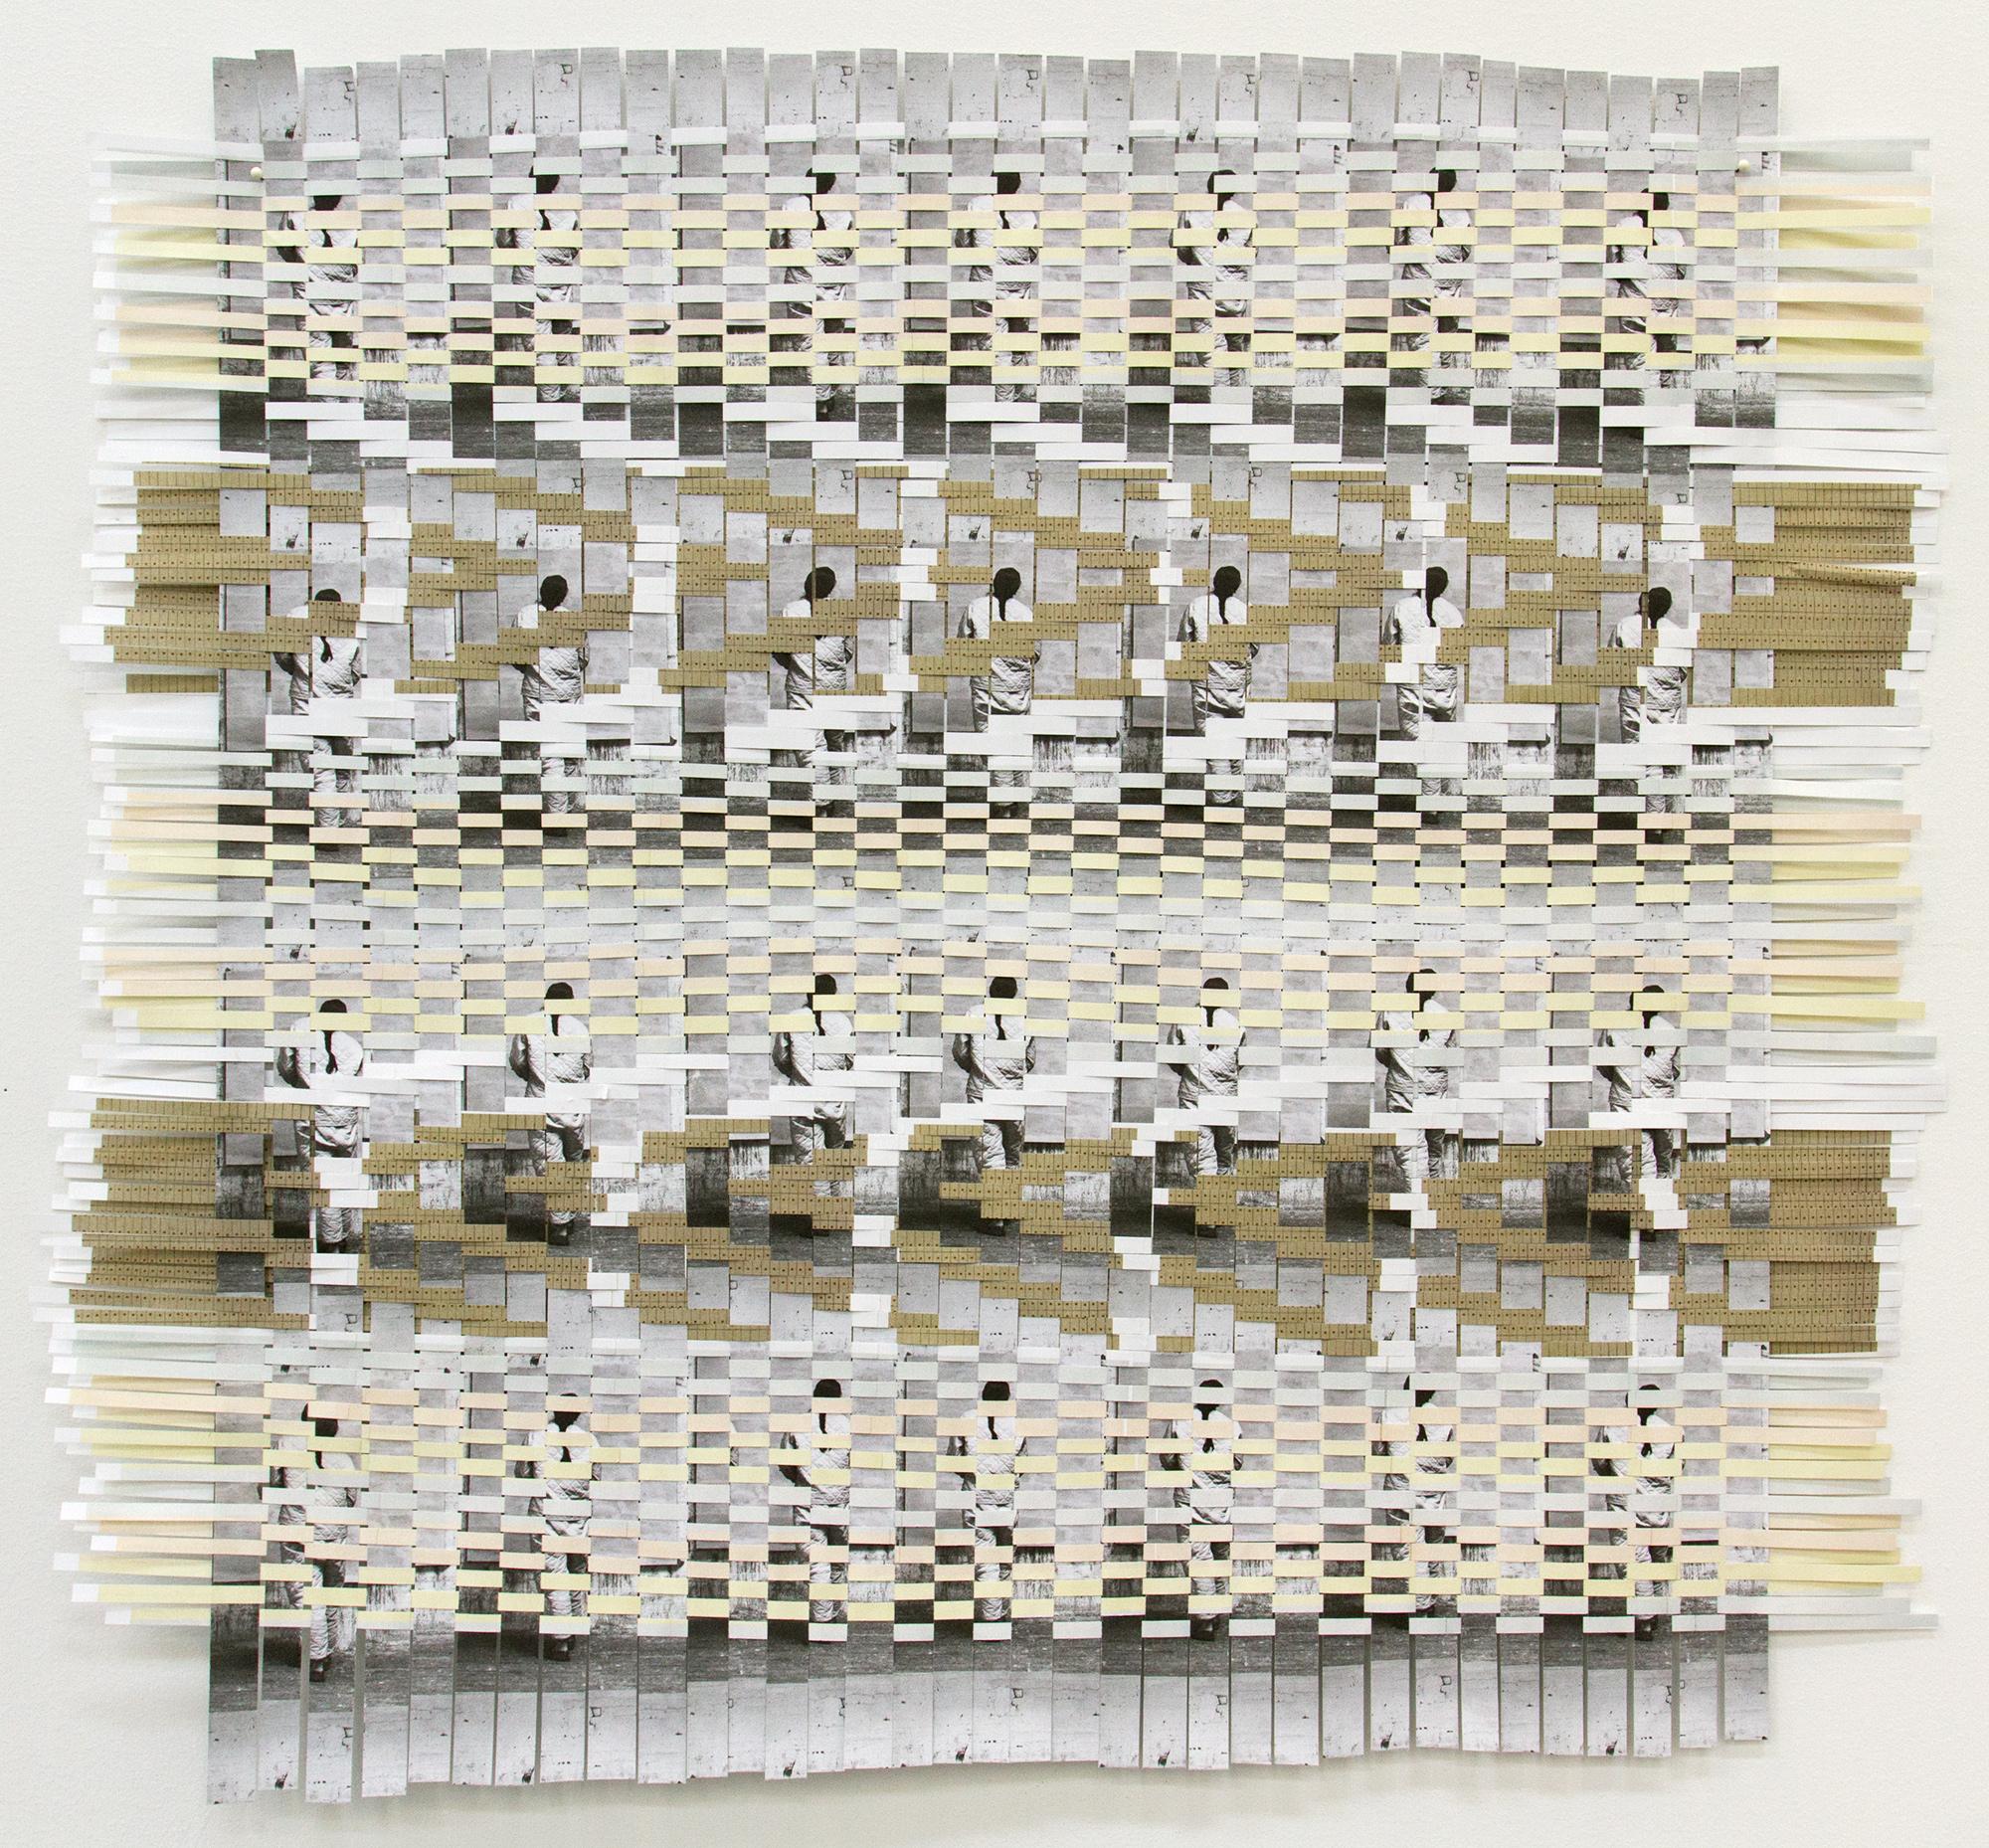 agnesmartin, 2017, woven exhibition brochures, 26.5 x 29 in.